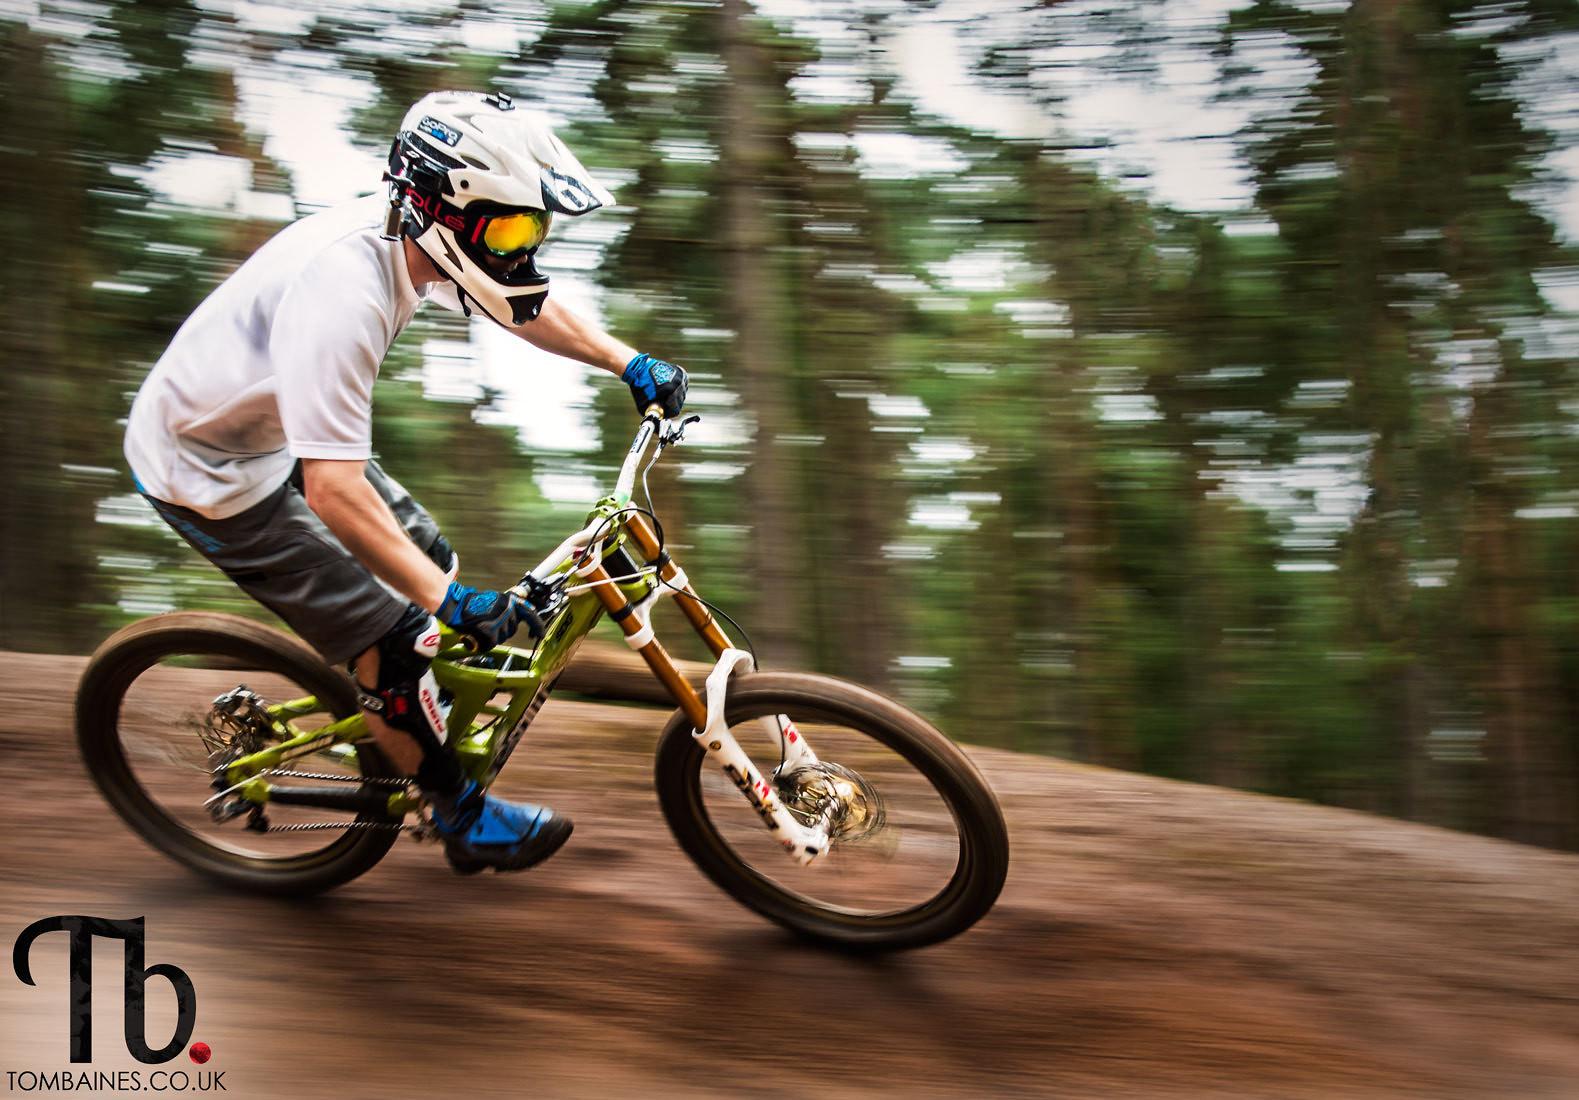 Pan shot - KillerXL5 - Mountain Biking Pictures - Vital MTB